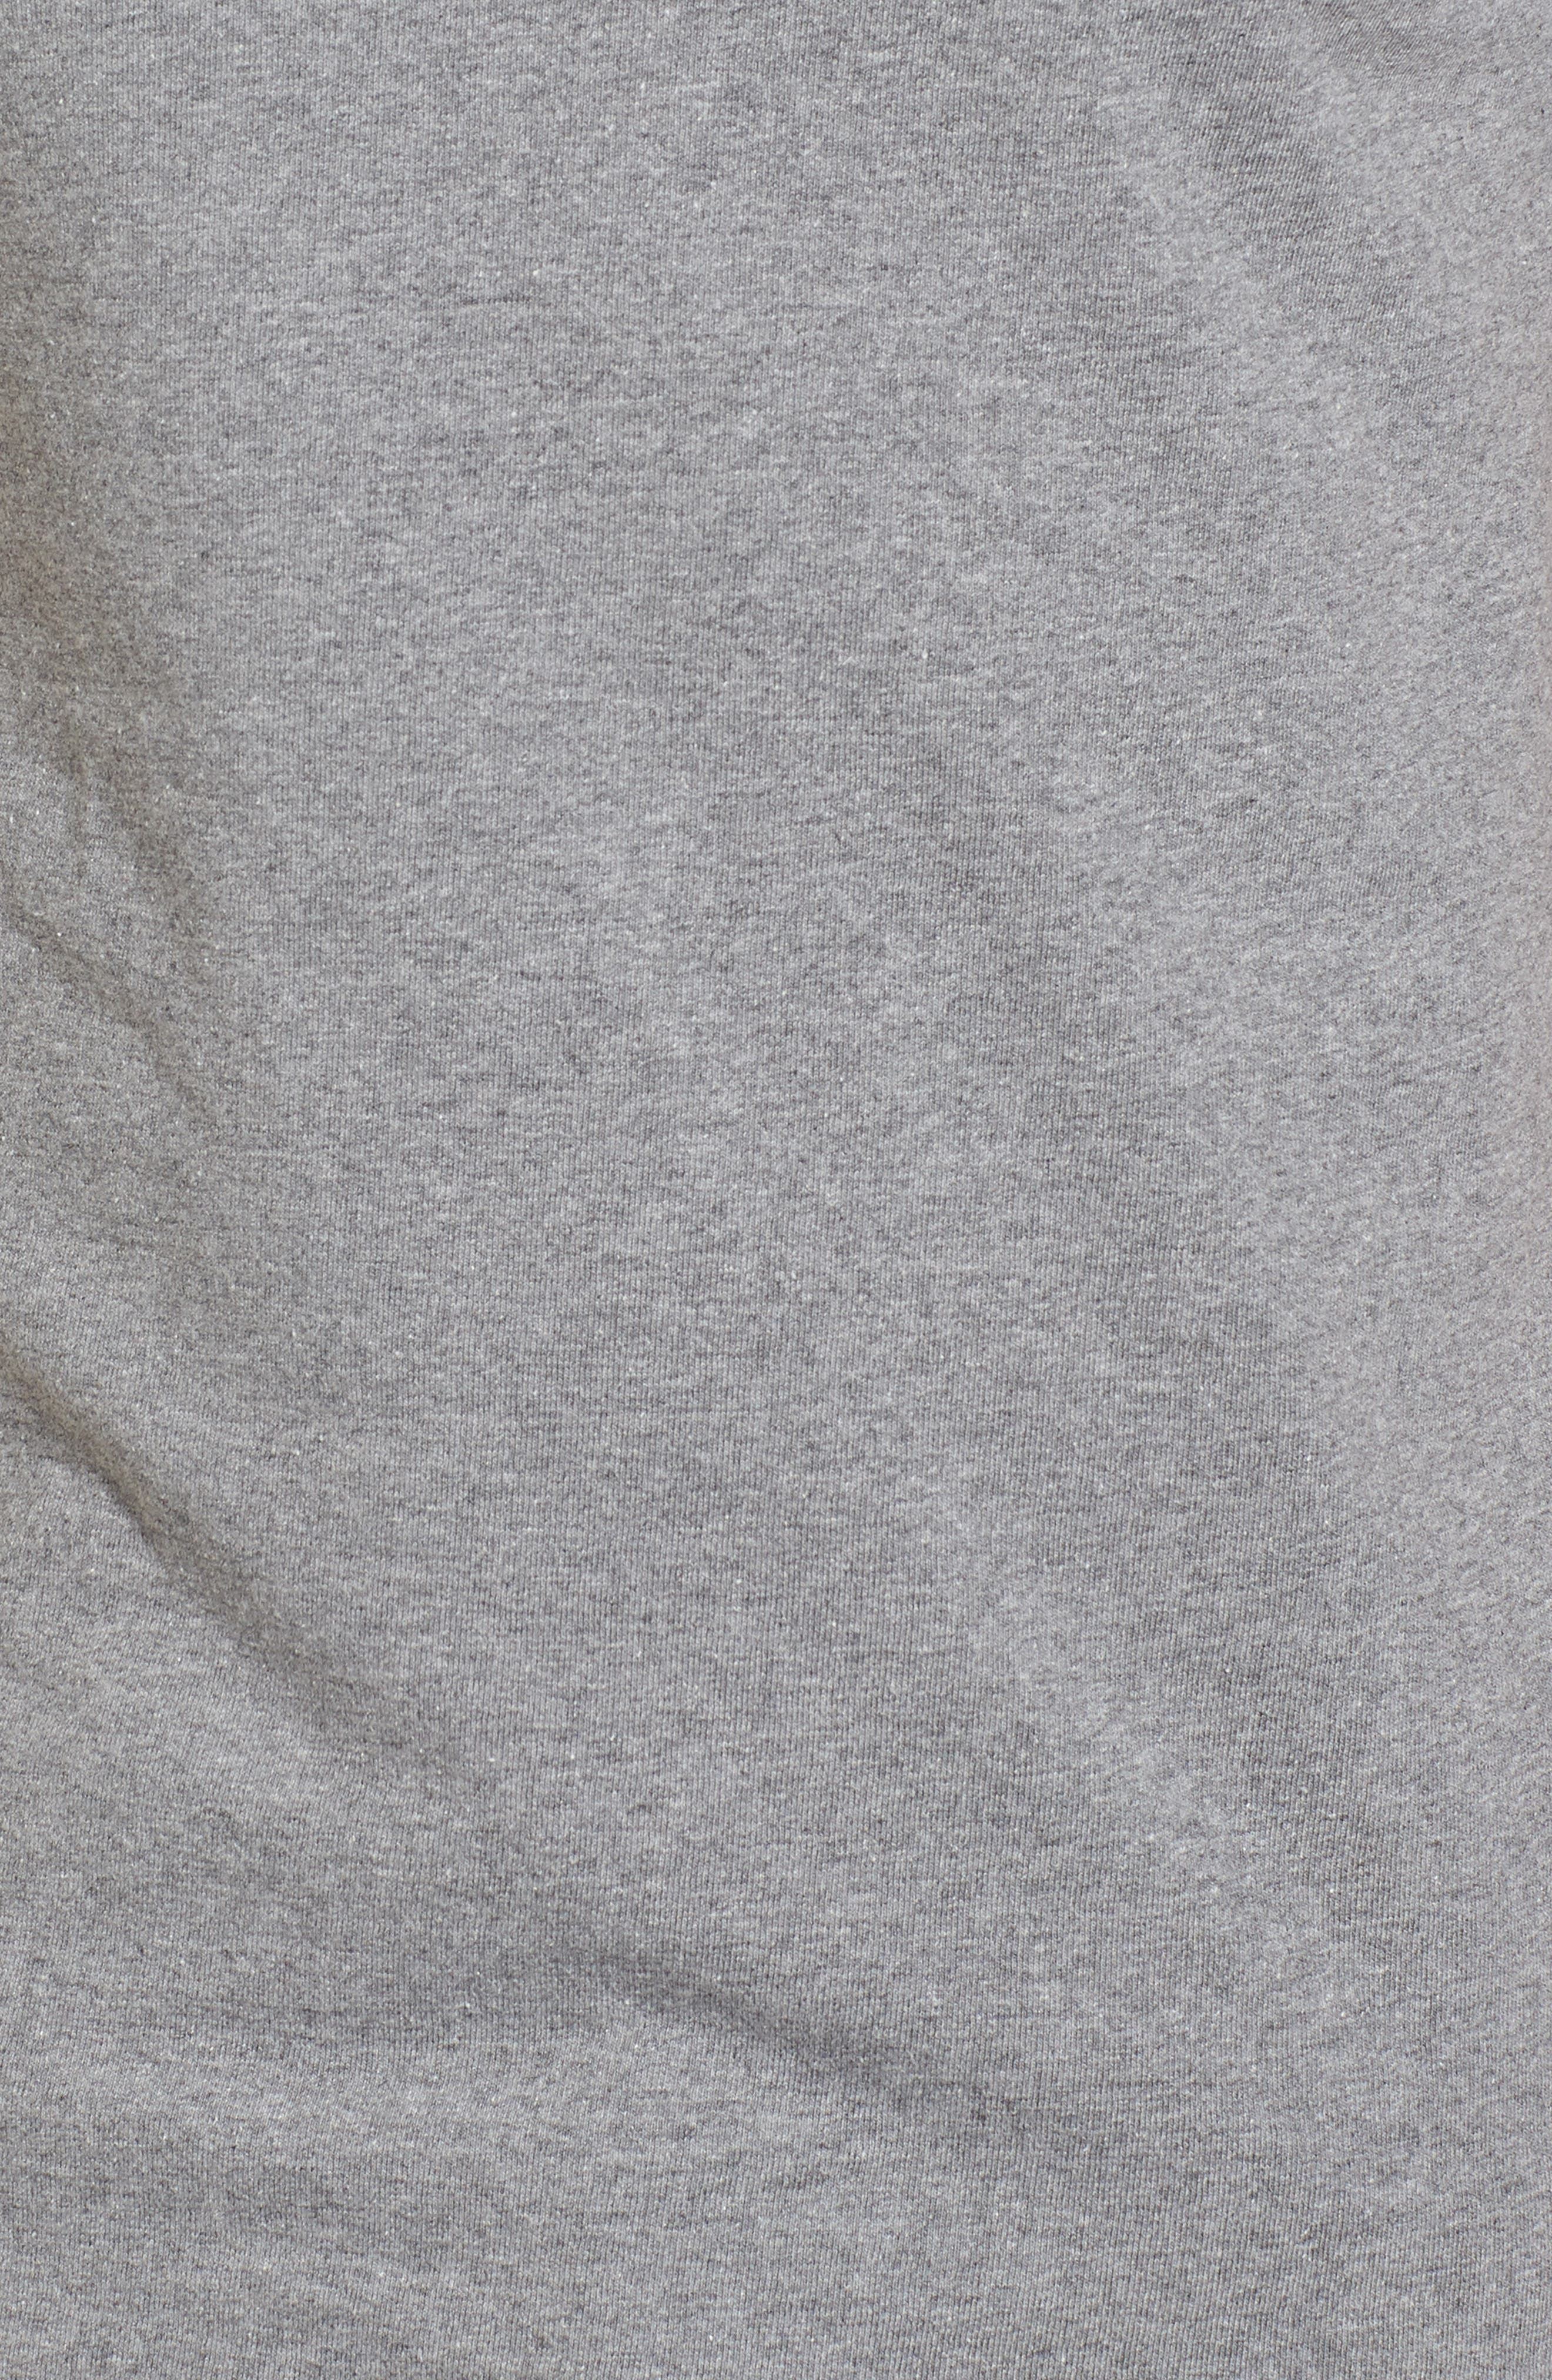 Glacier View Rising Responsibili-Tee T-Shirt,                             Alternate thumbnail 5, color,                             020